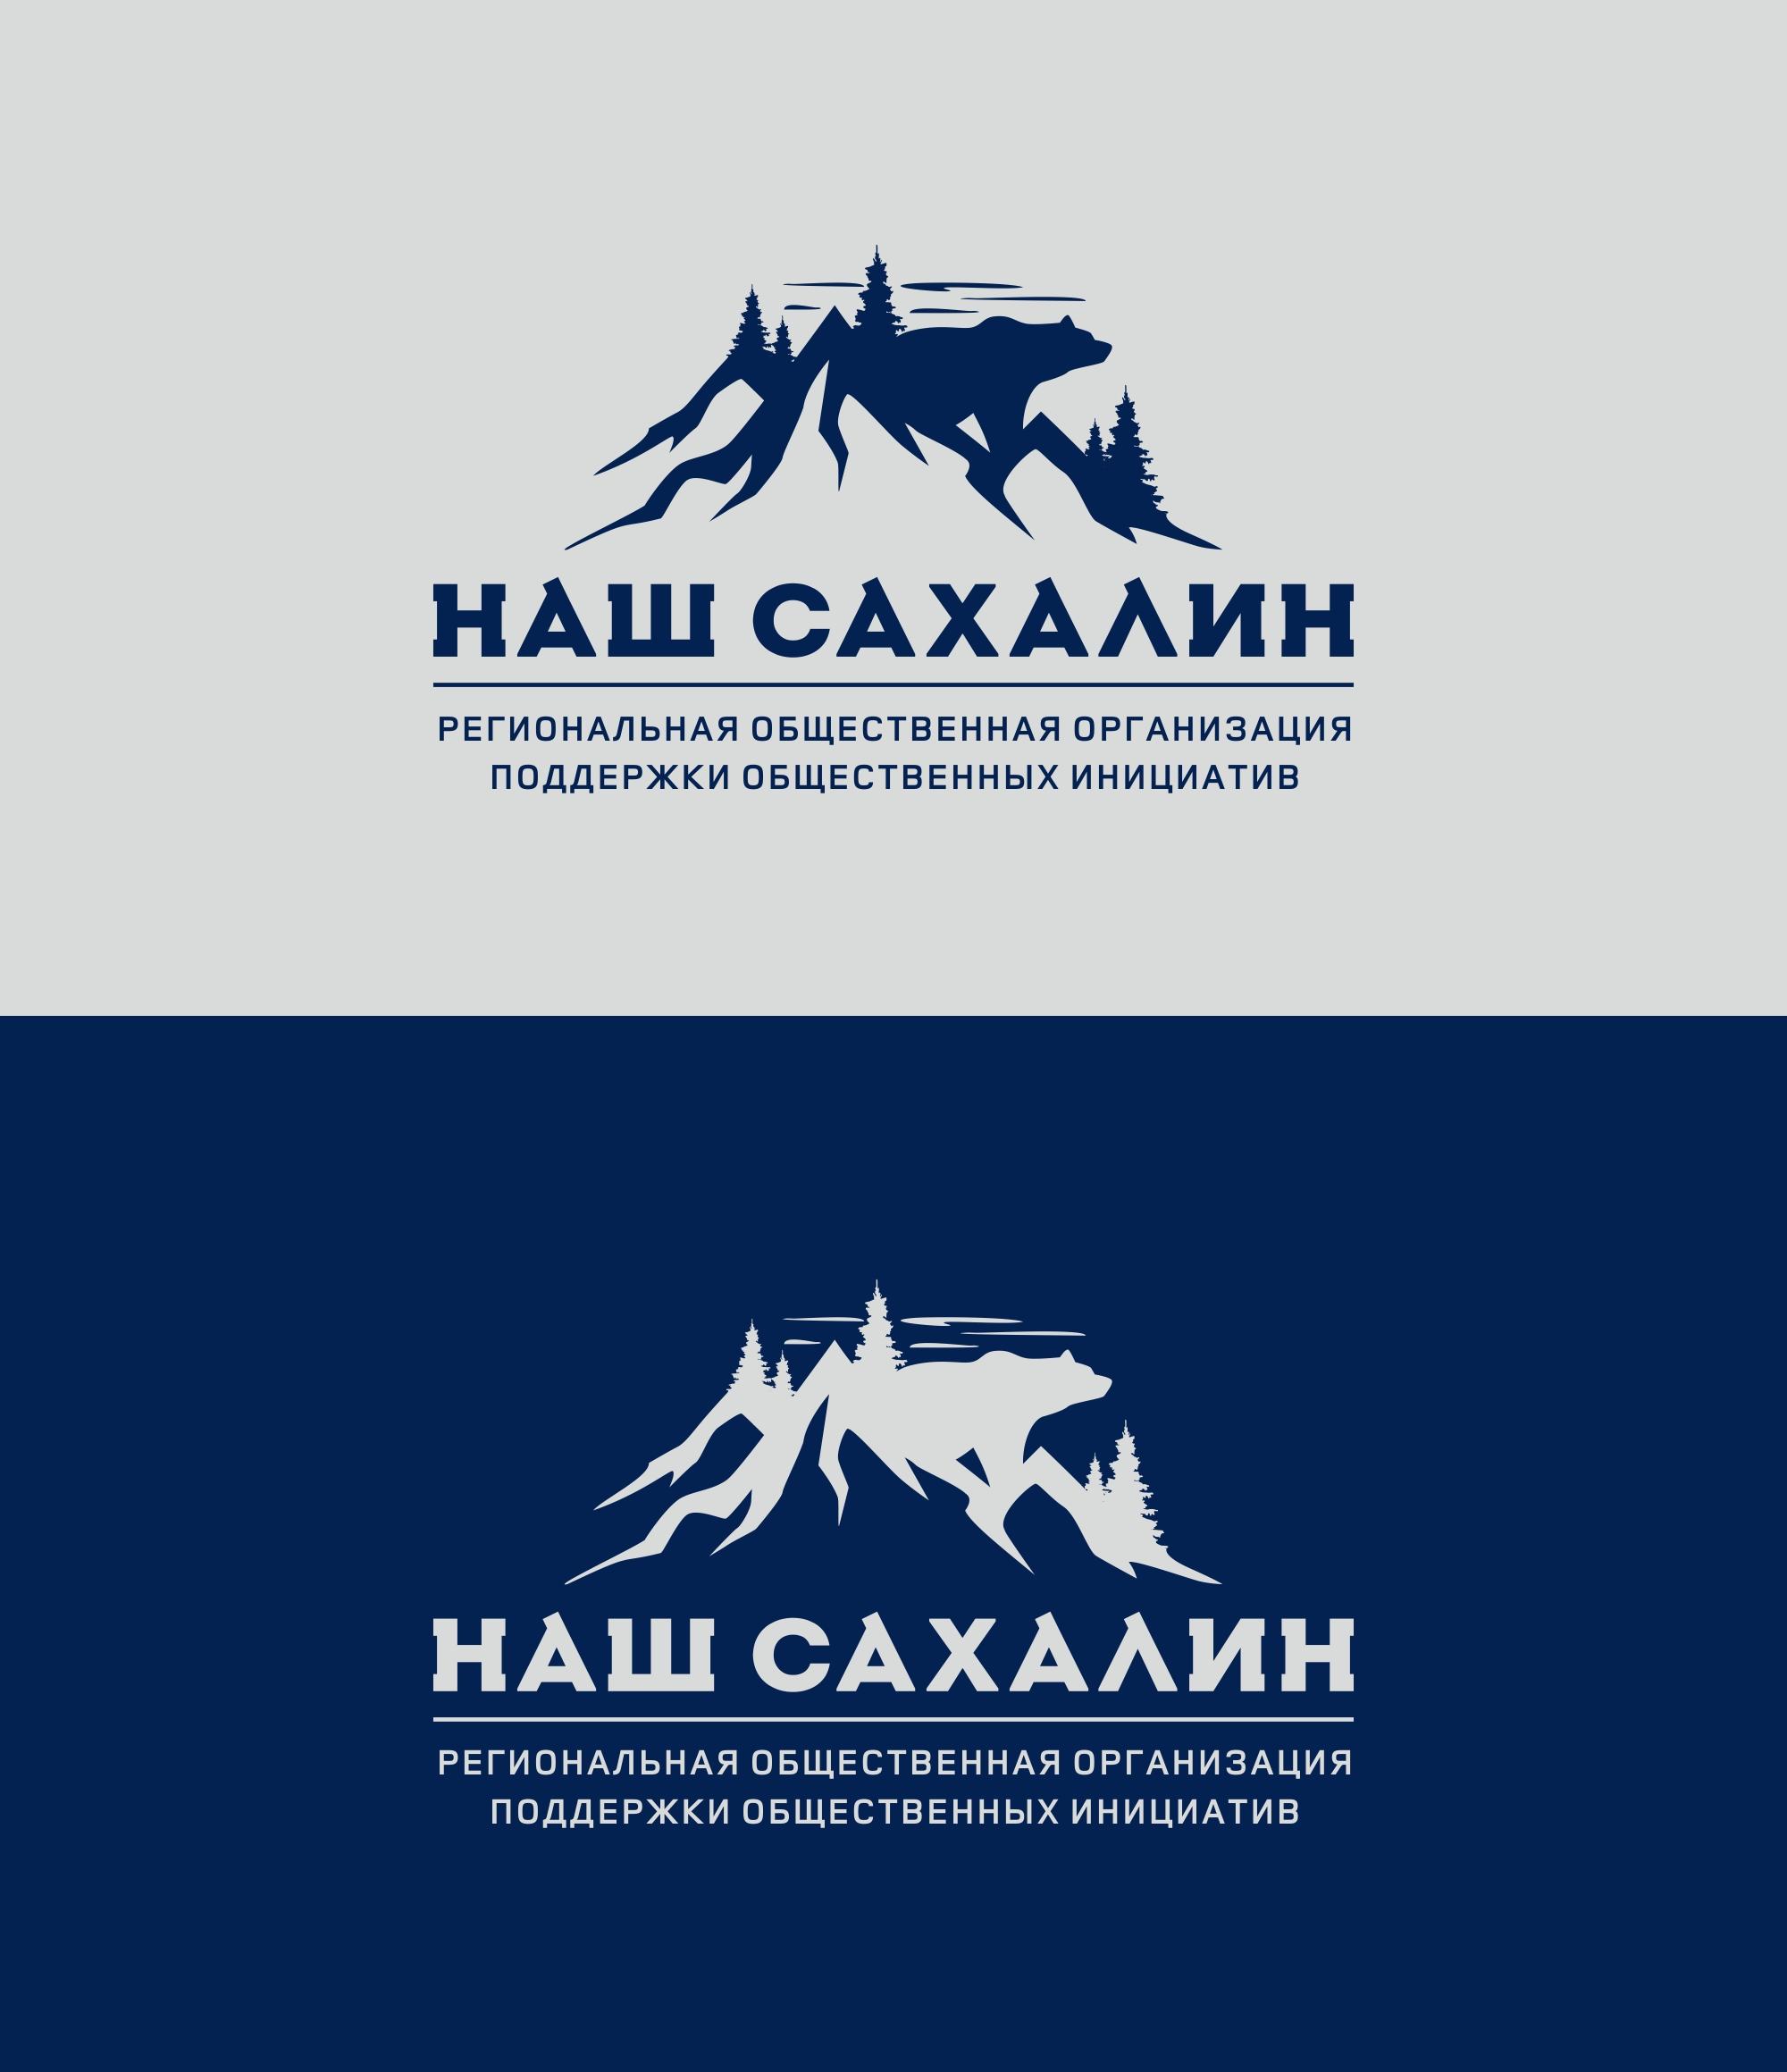 "Логотип для некоммерческой организации ""Наш Сахалин"" фото f_2905a7e08dfd0a90.jpg"